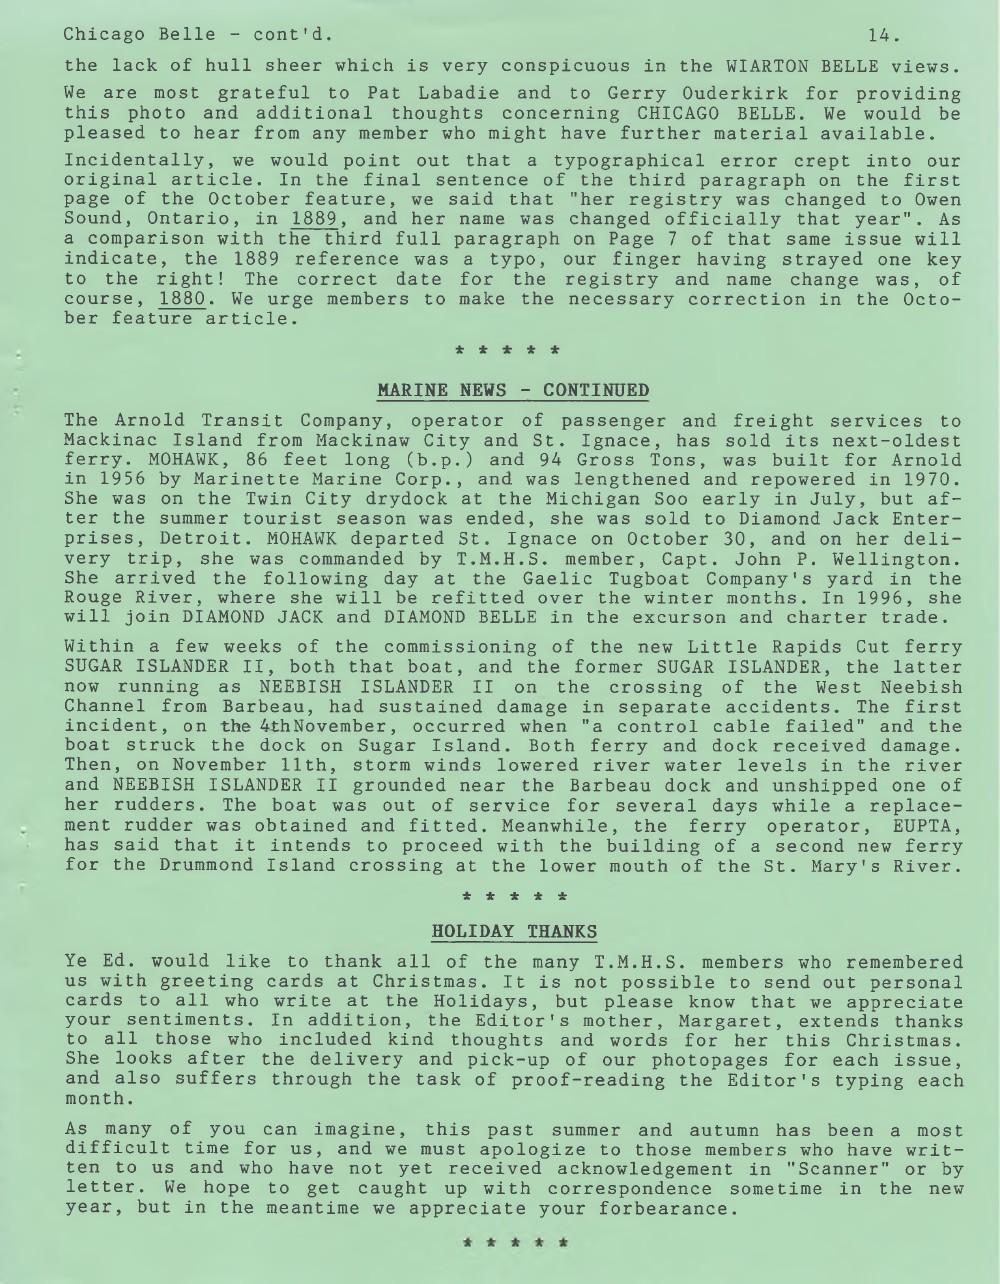 Scanner, v. 28, no. 4 (January 1996)